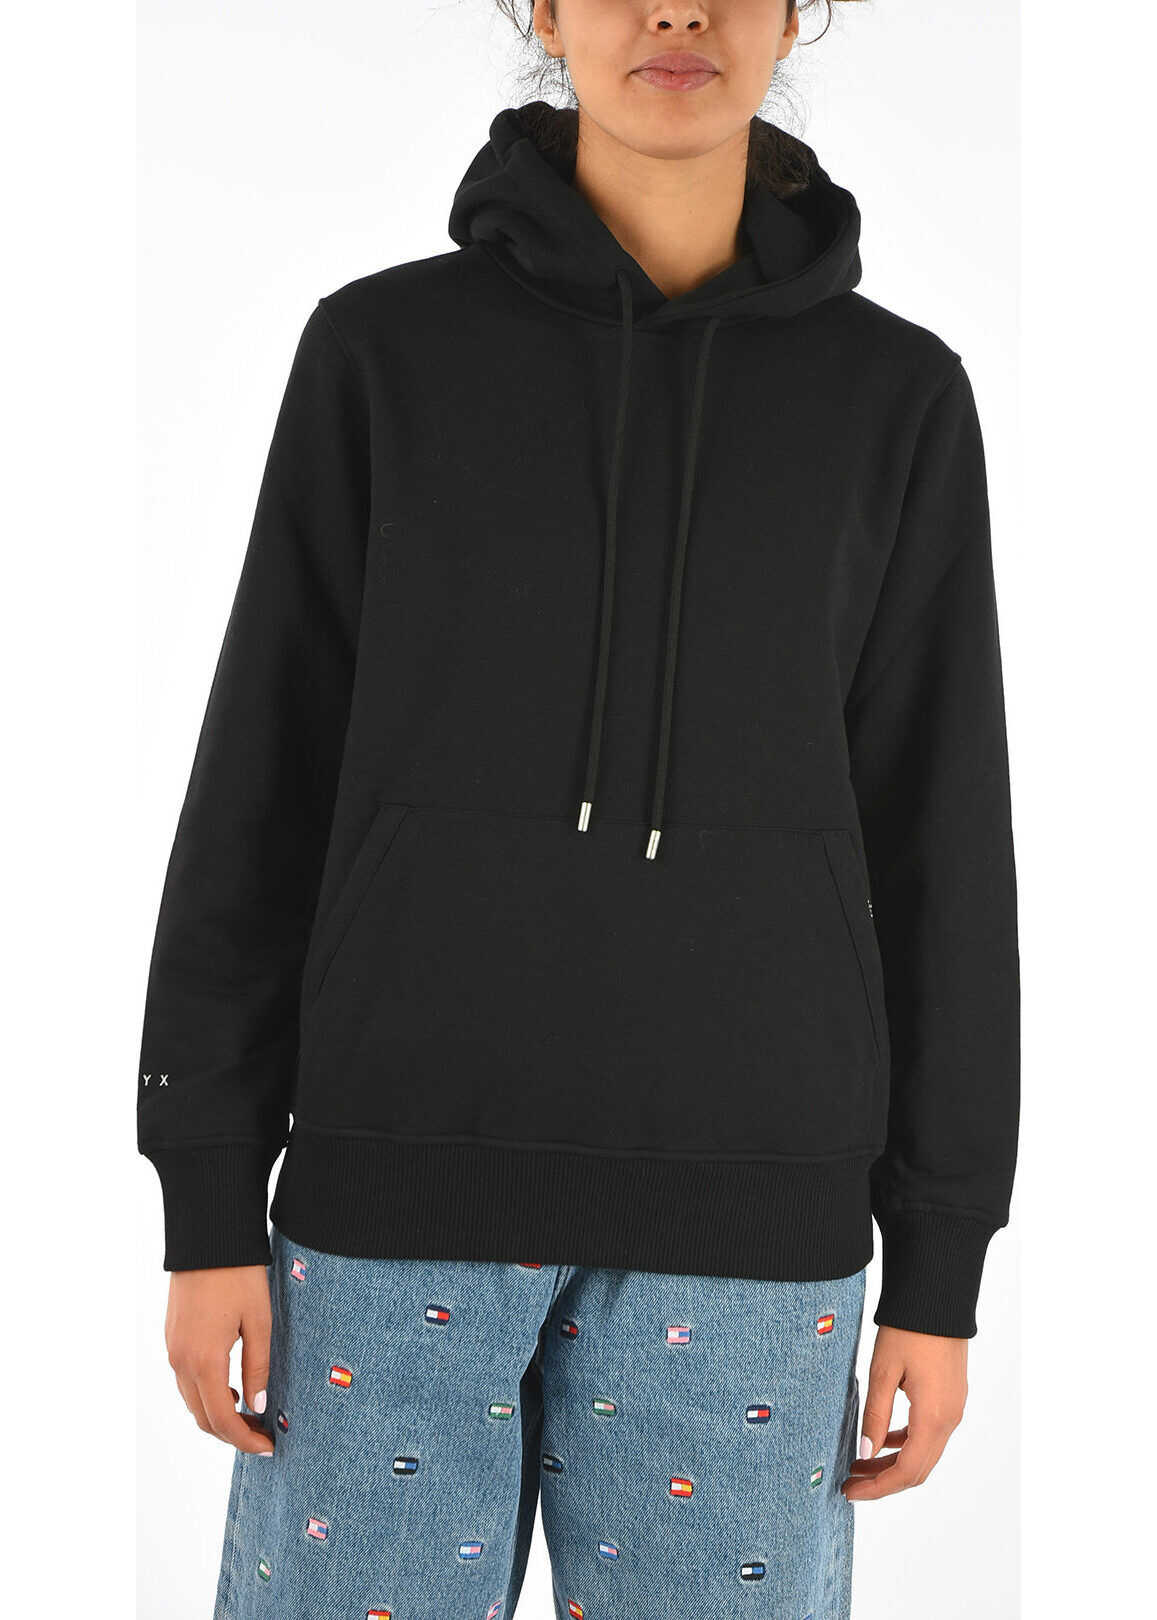 Alyx VISUAL Hooded Sweatshirt BLACK